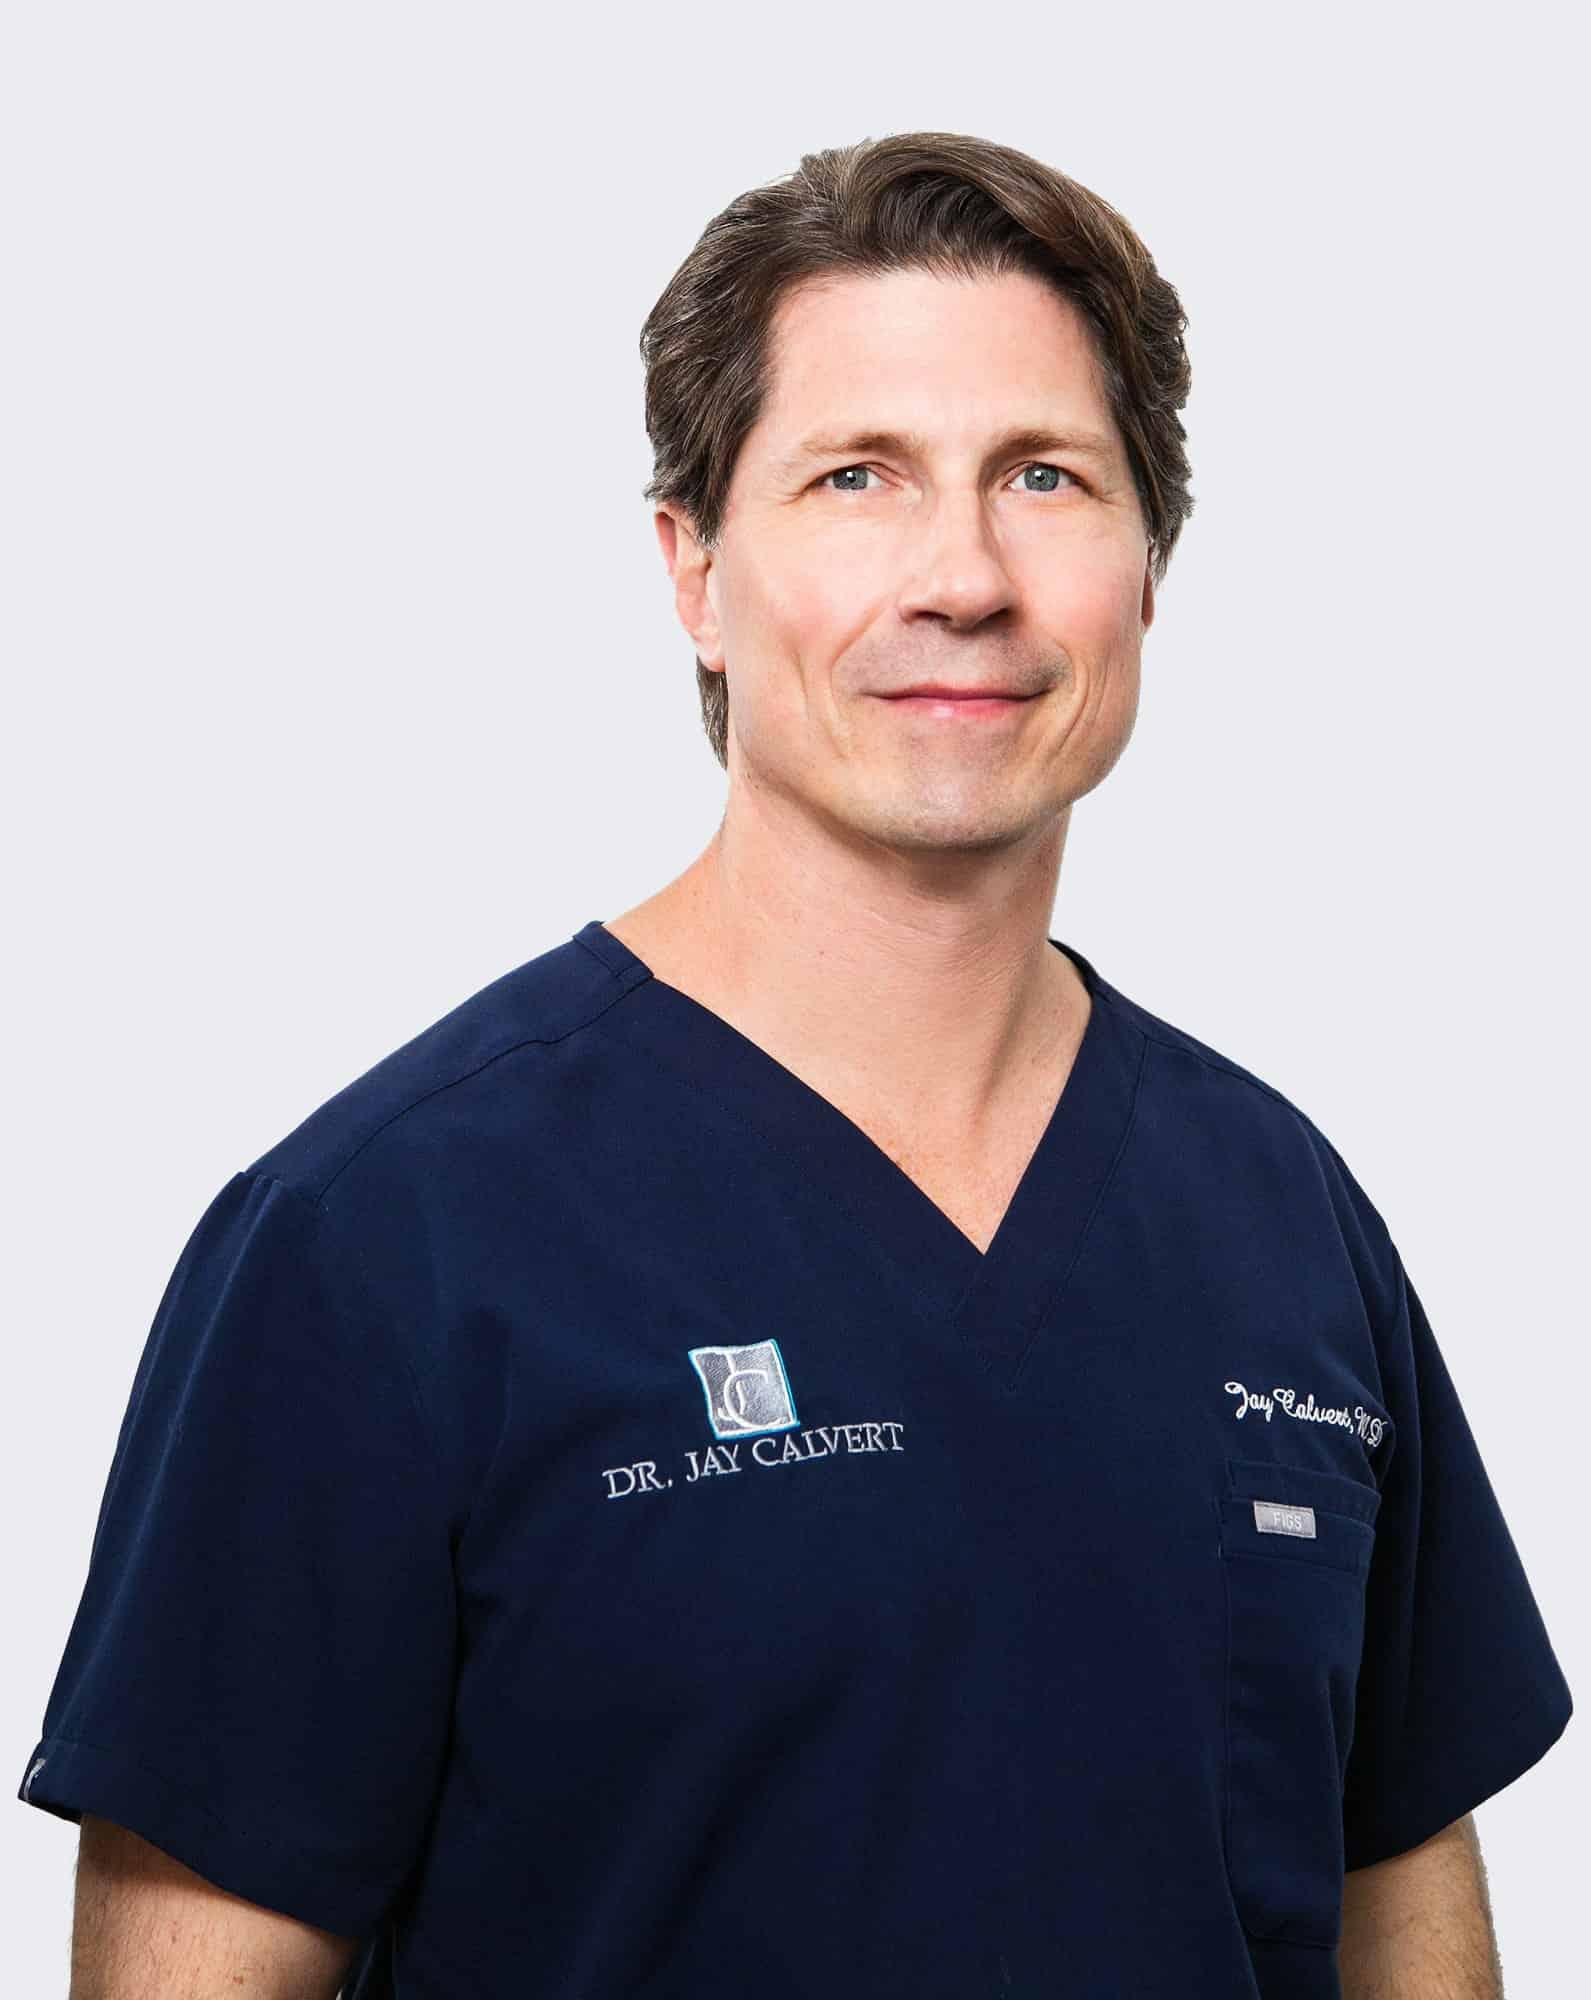 dr jay calvert expert rhinoplasty surgeon